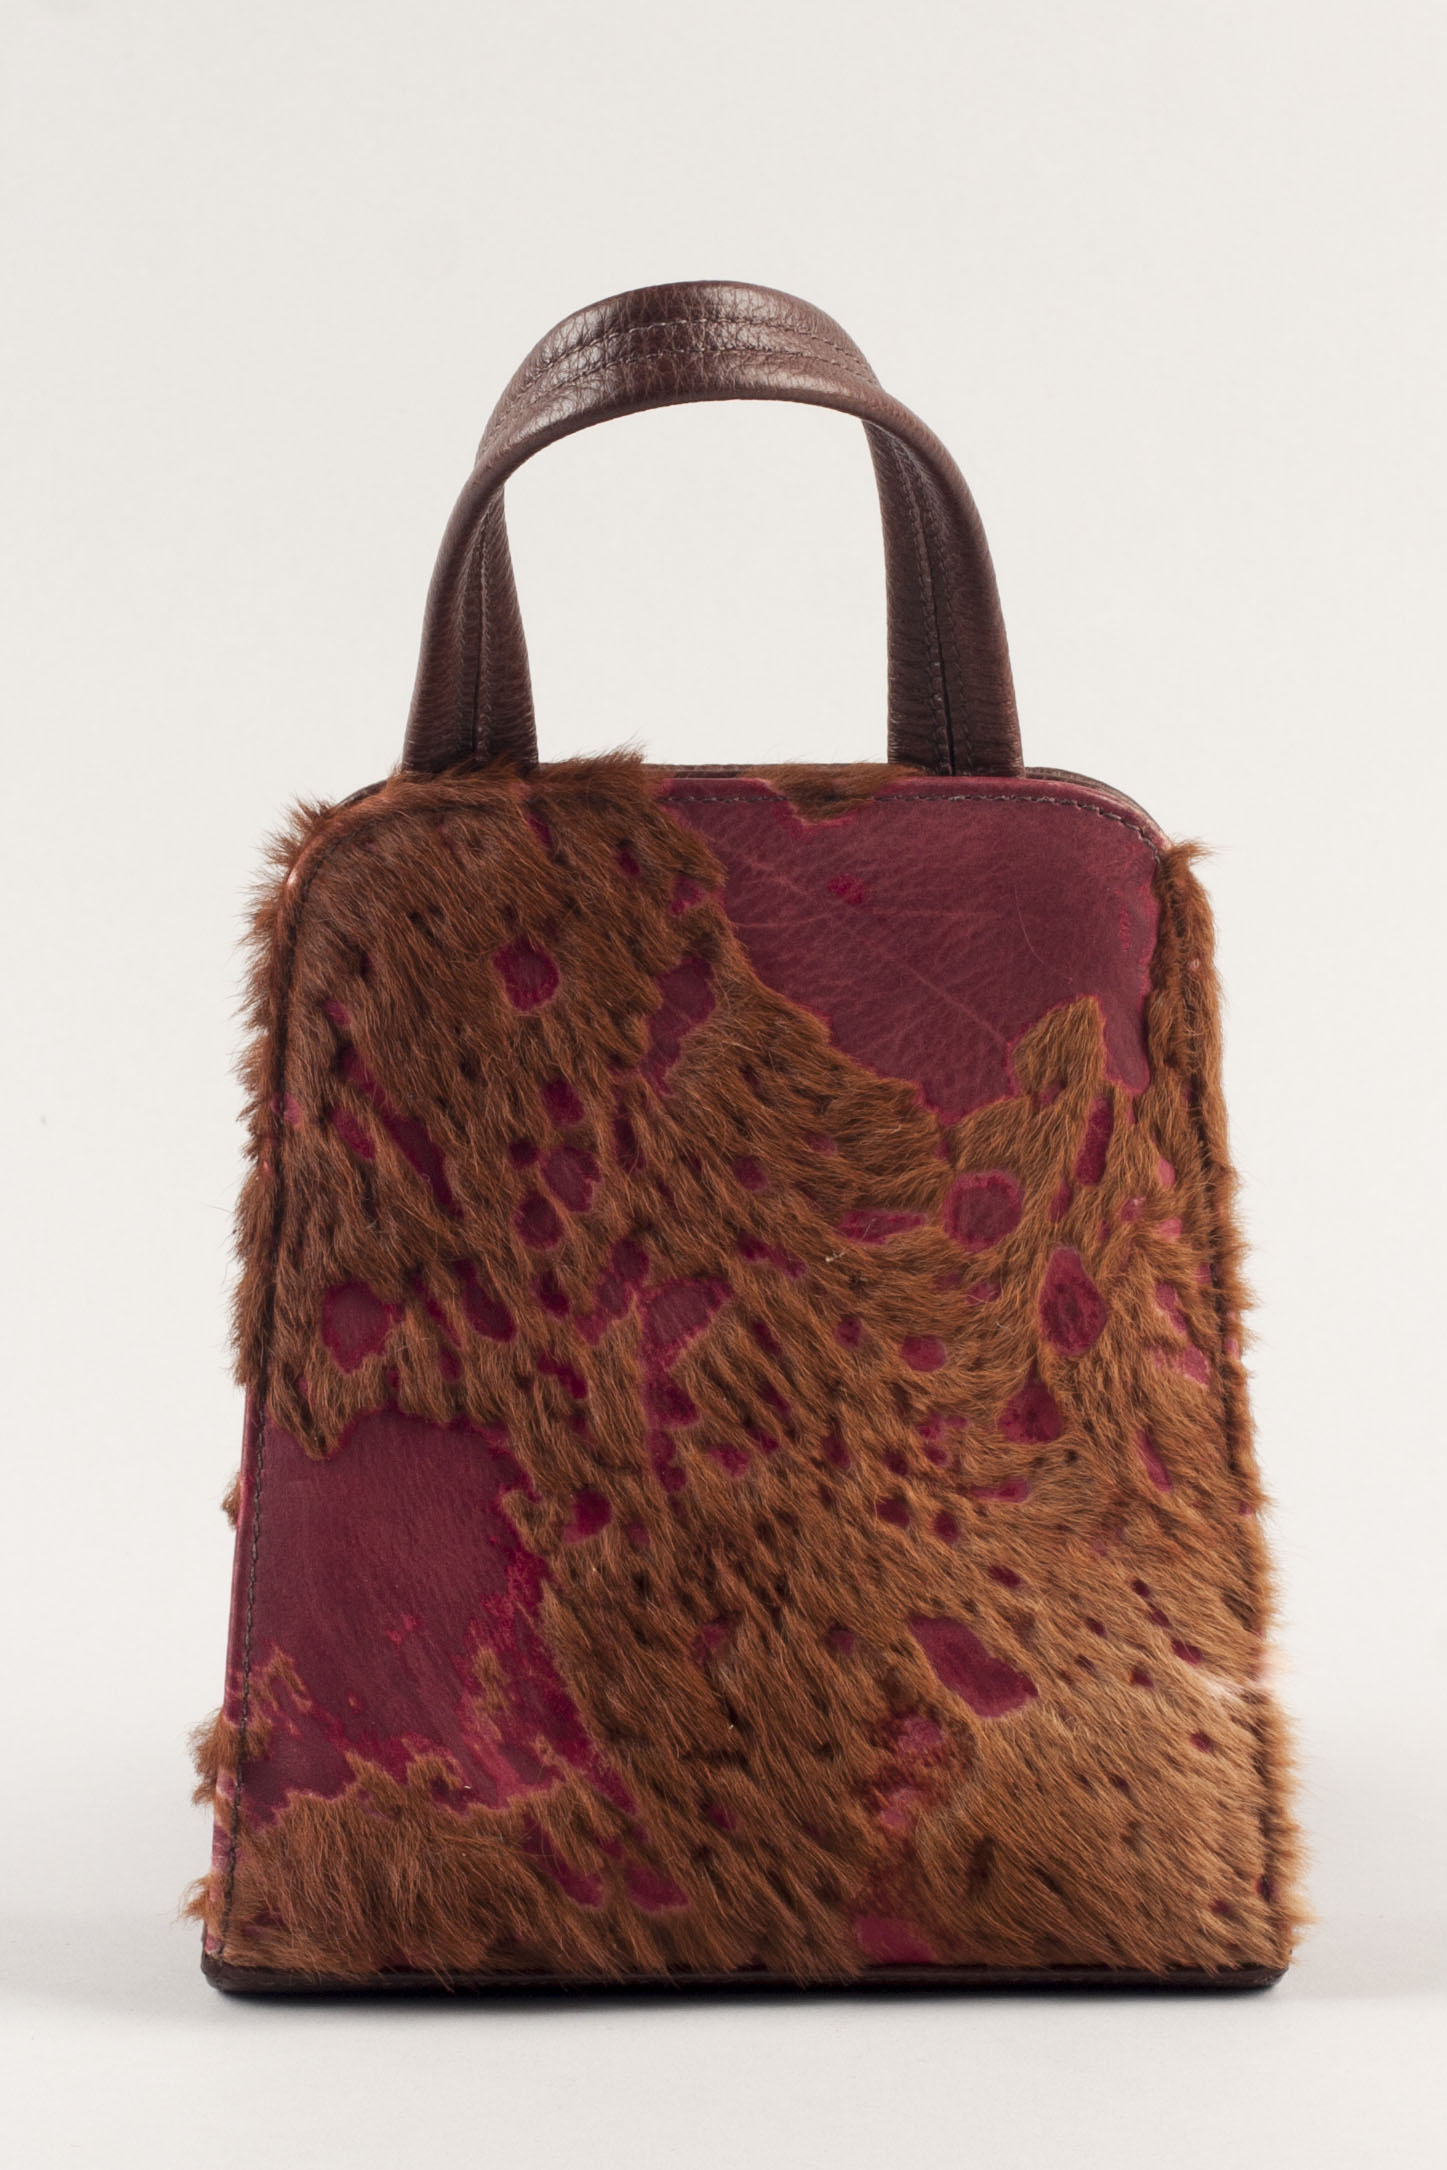 Jackson Day Bag - Burgundy/Mahogany